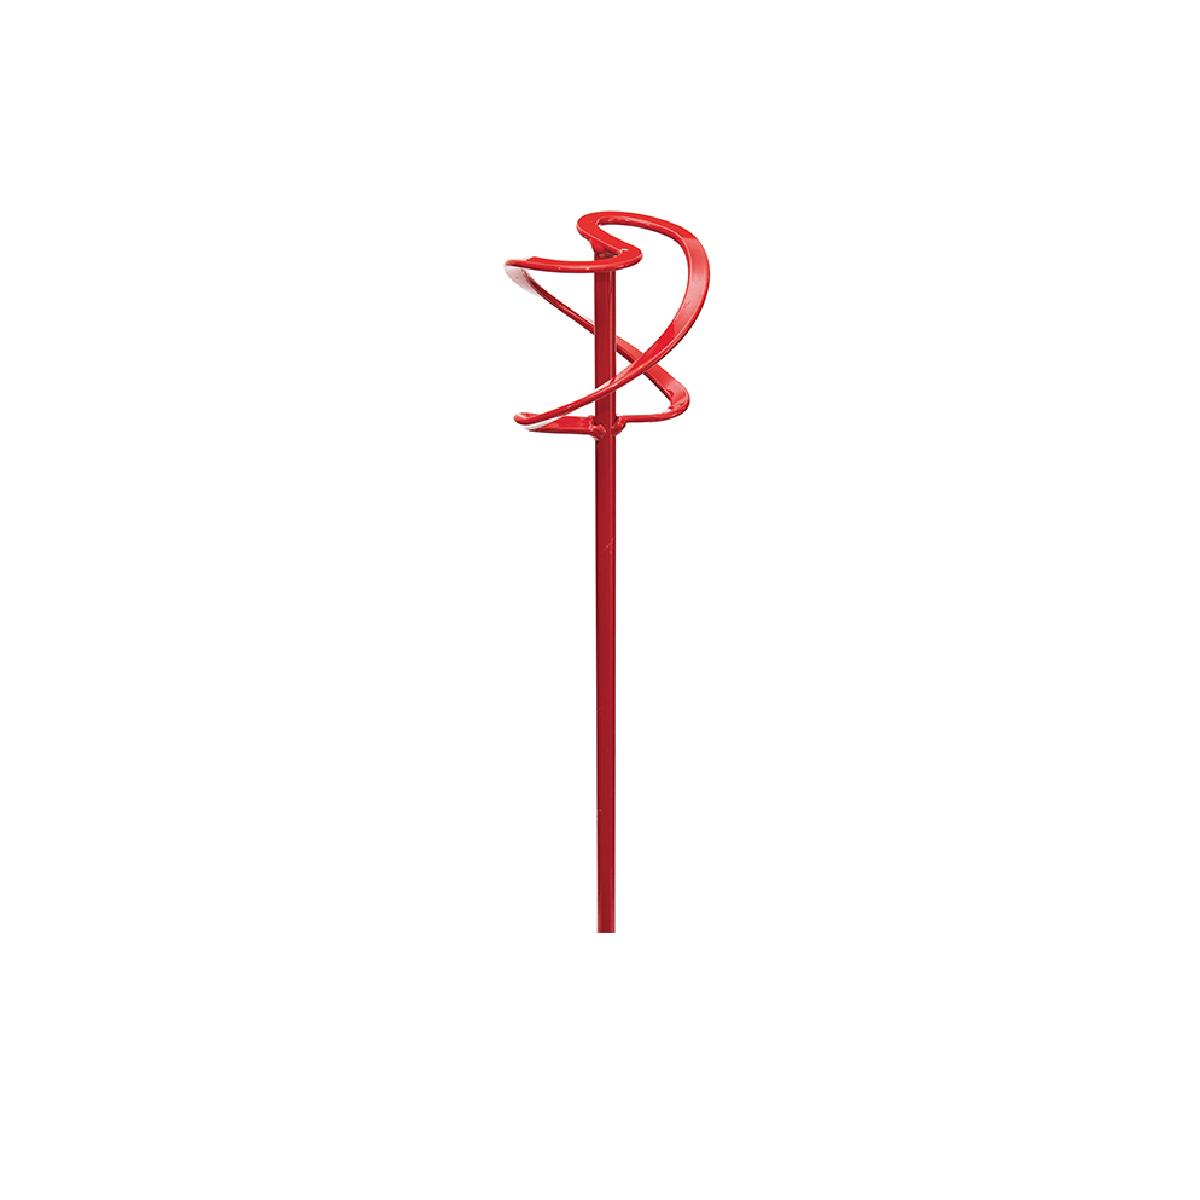 Misturador Argamassa- Tinta p/ Mandril Metalsul